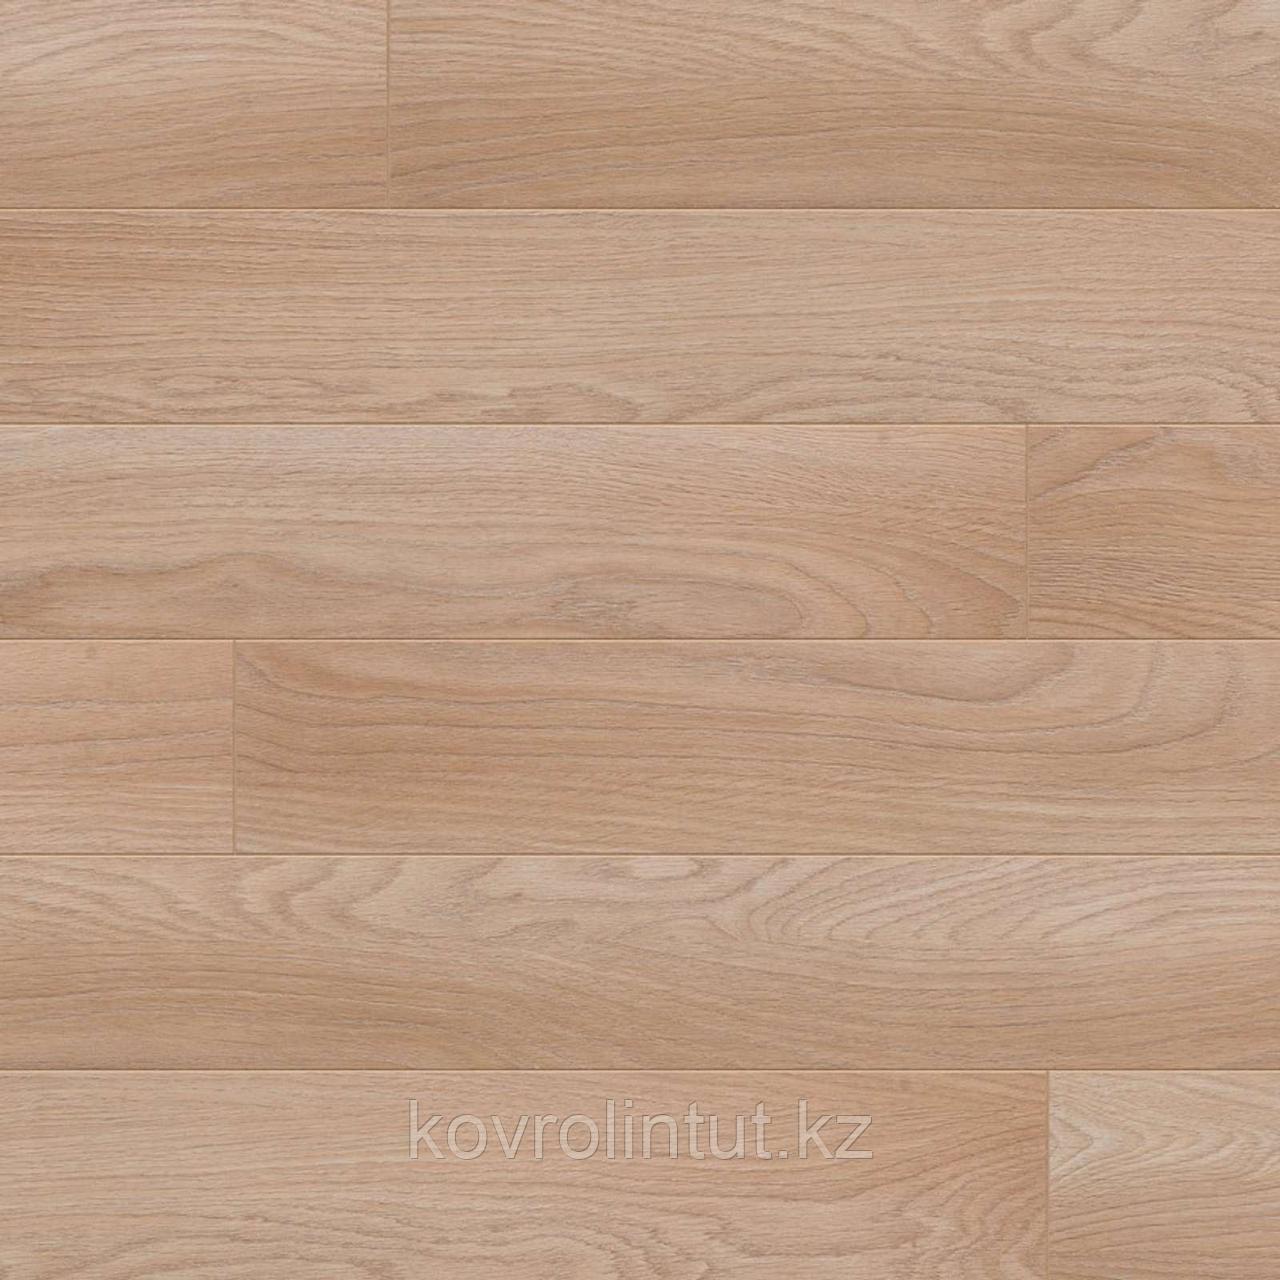 Ламинат Classen Discovery 54706 Verden Oak Snow, 1285x158х10мм, 32кл (1,624м2, 8шт в уп)